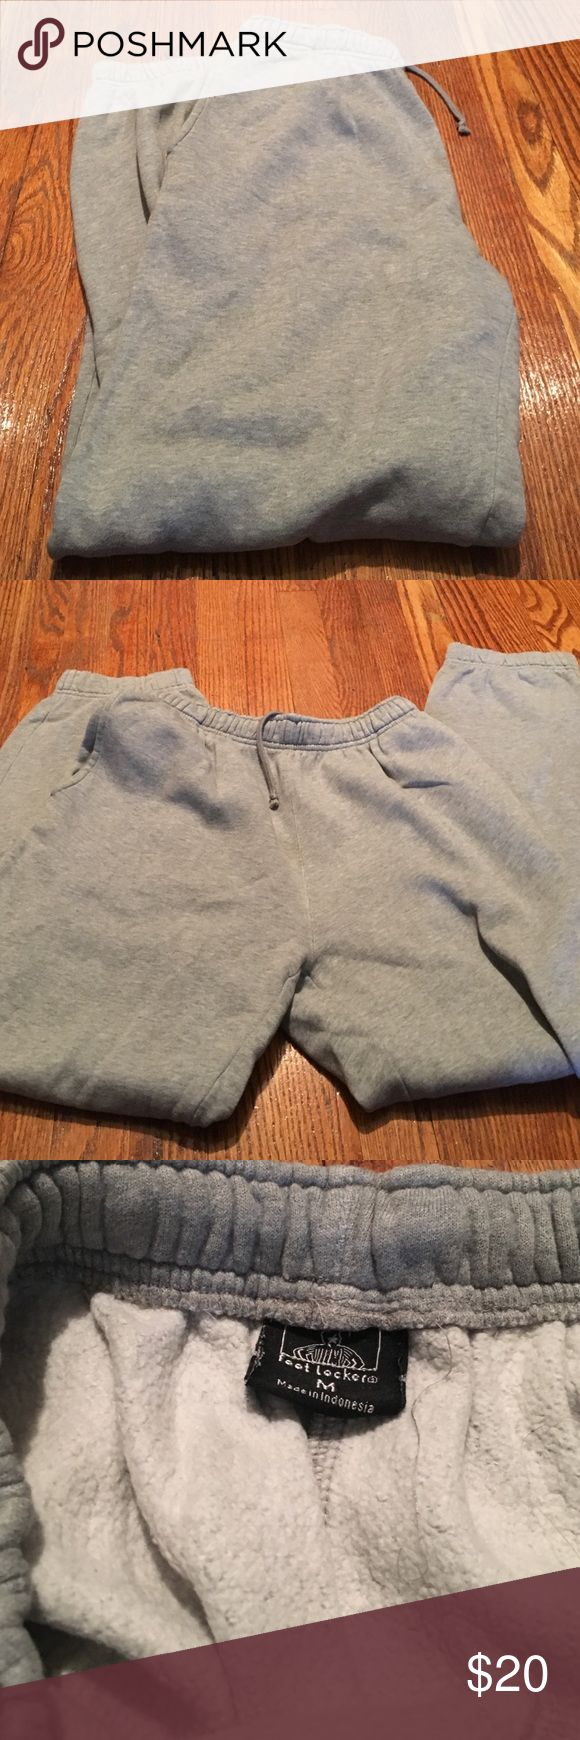 Footlocker Grey Sweatpants Grey sweatpants footlocker Pants Sweatpants & Joggers